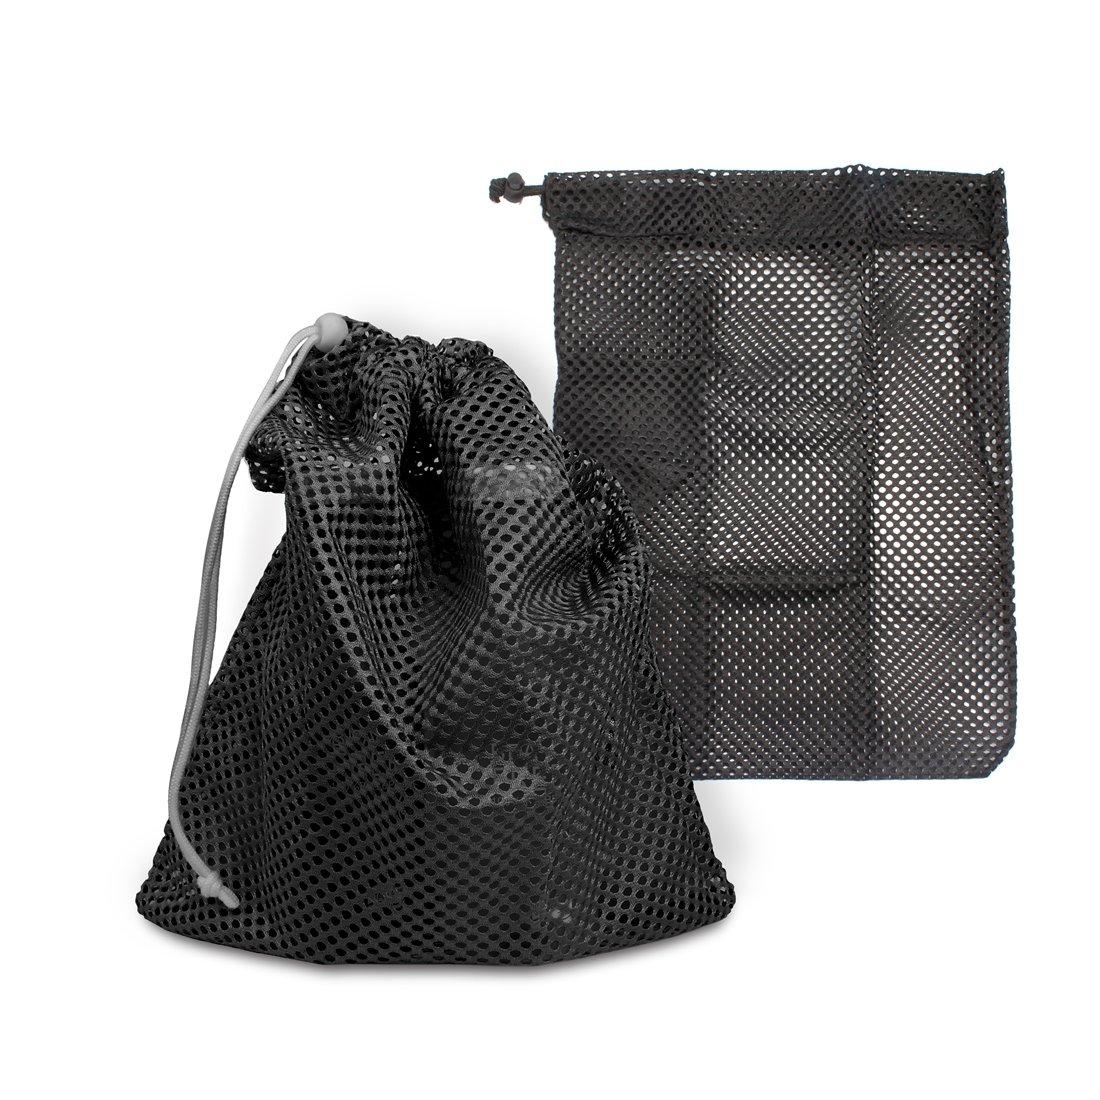 Storage Bags Cheap Price Bag Gym Swim Dance Shoes Backpack Bundle Custom Nylon Drawstring Bag Rope Backpack Custom Bags Shoulder Bag To Make One Feel At Ease And Energetic